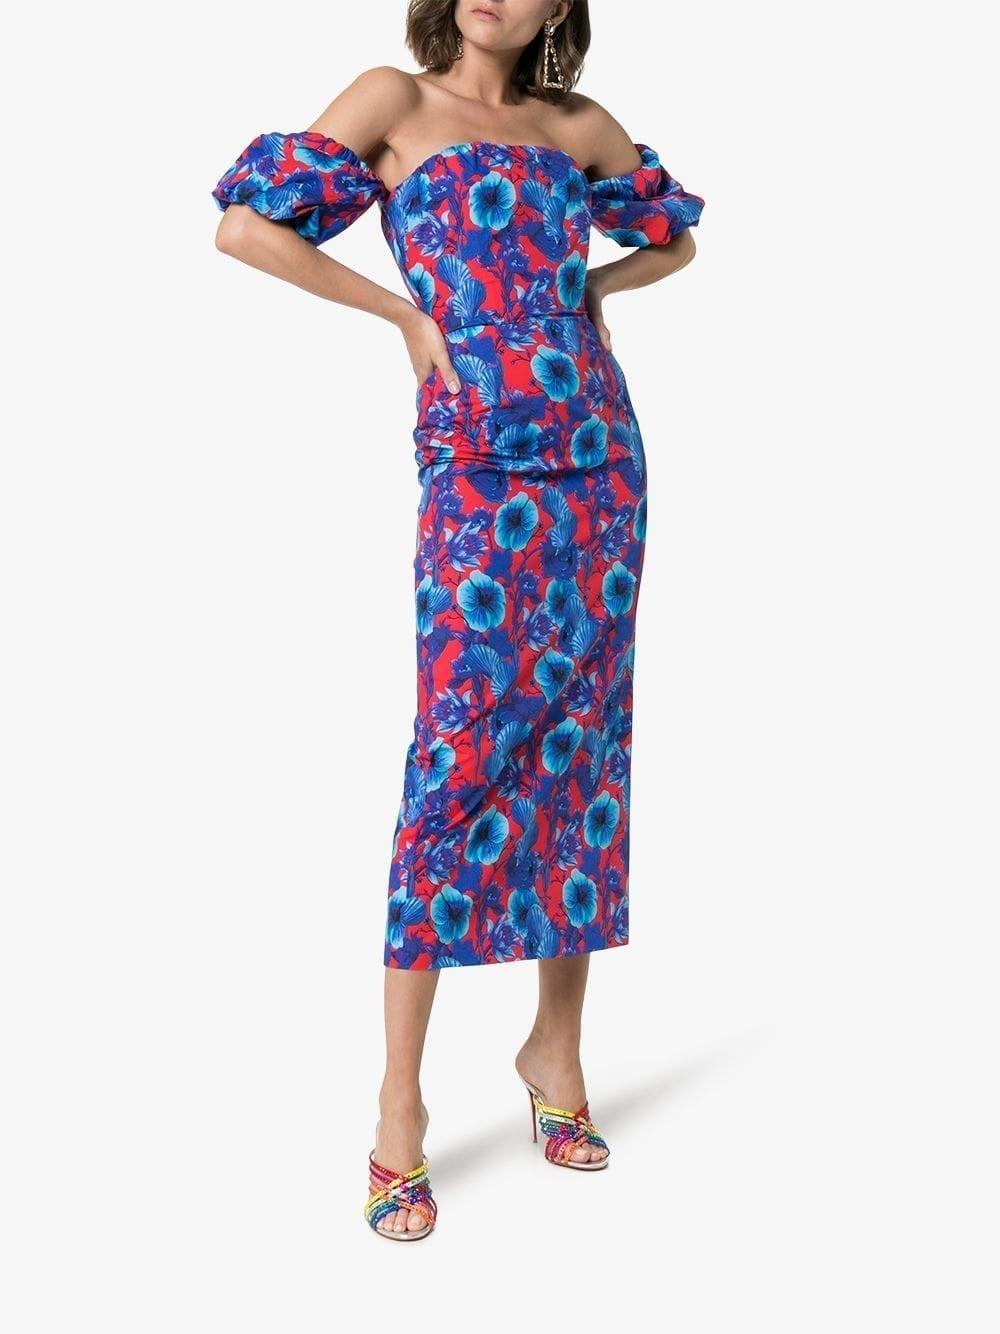 BORGO DE NOR Bardot Red / Floral Printed Dress